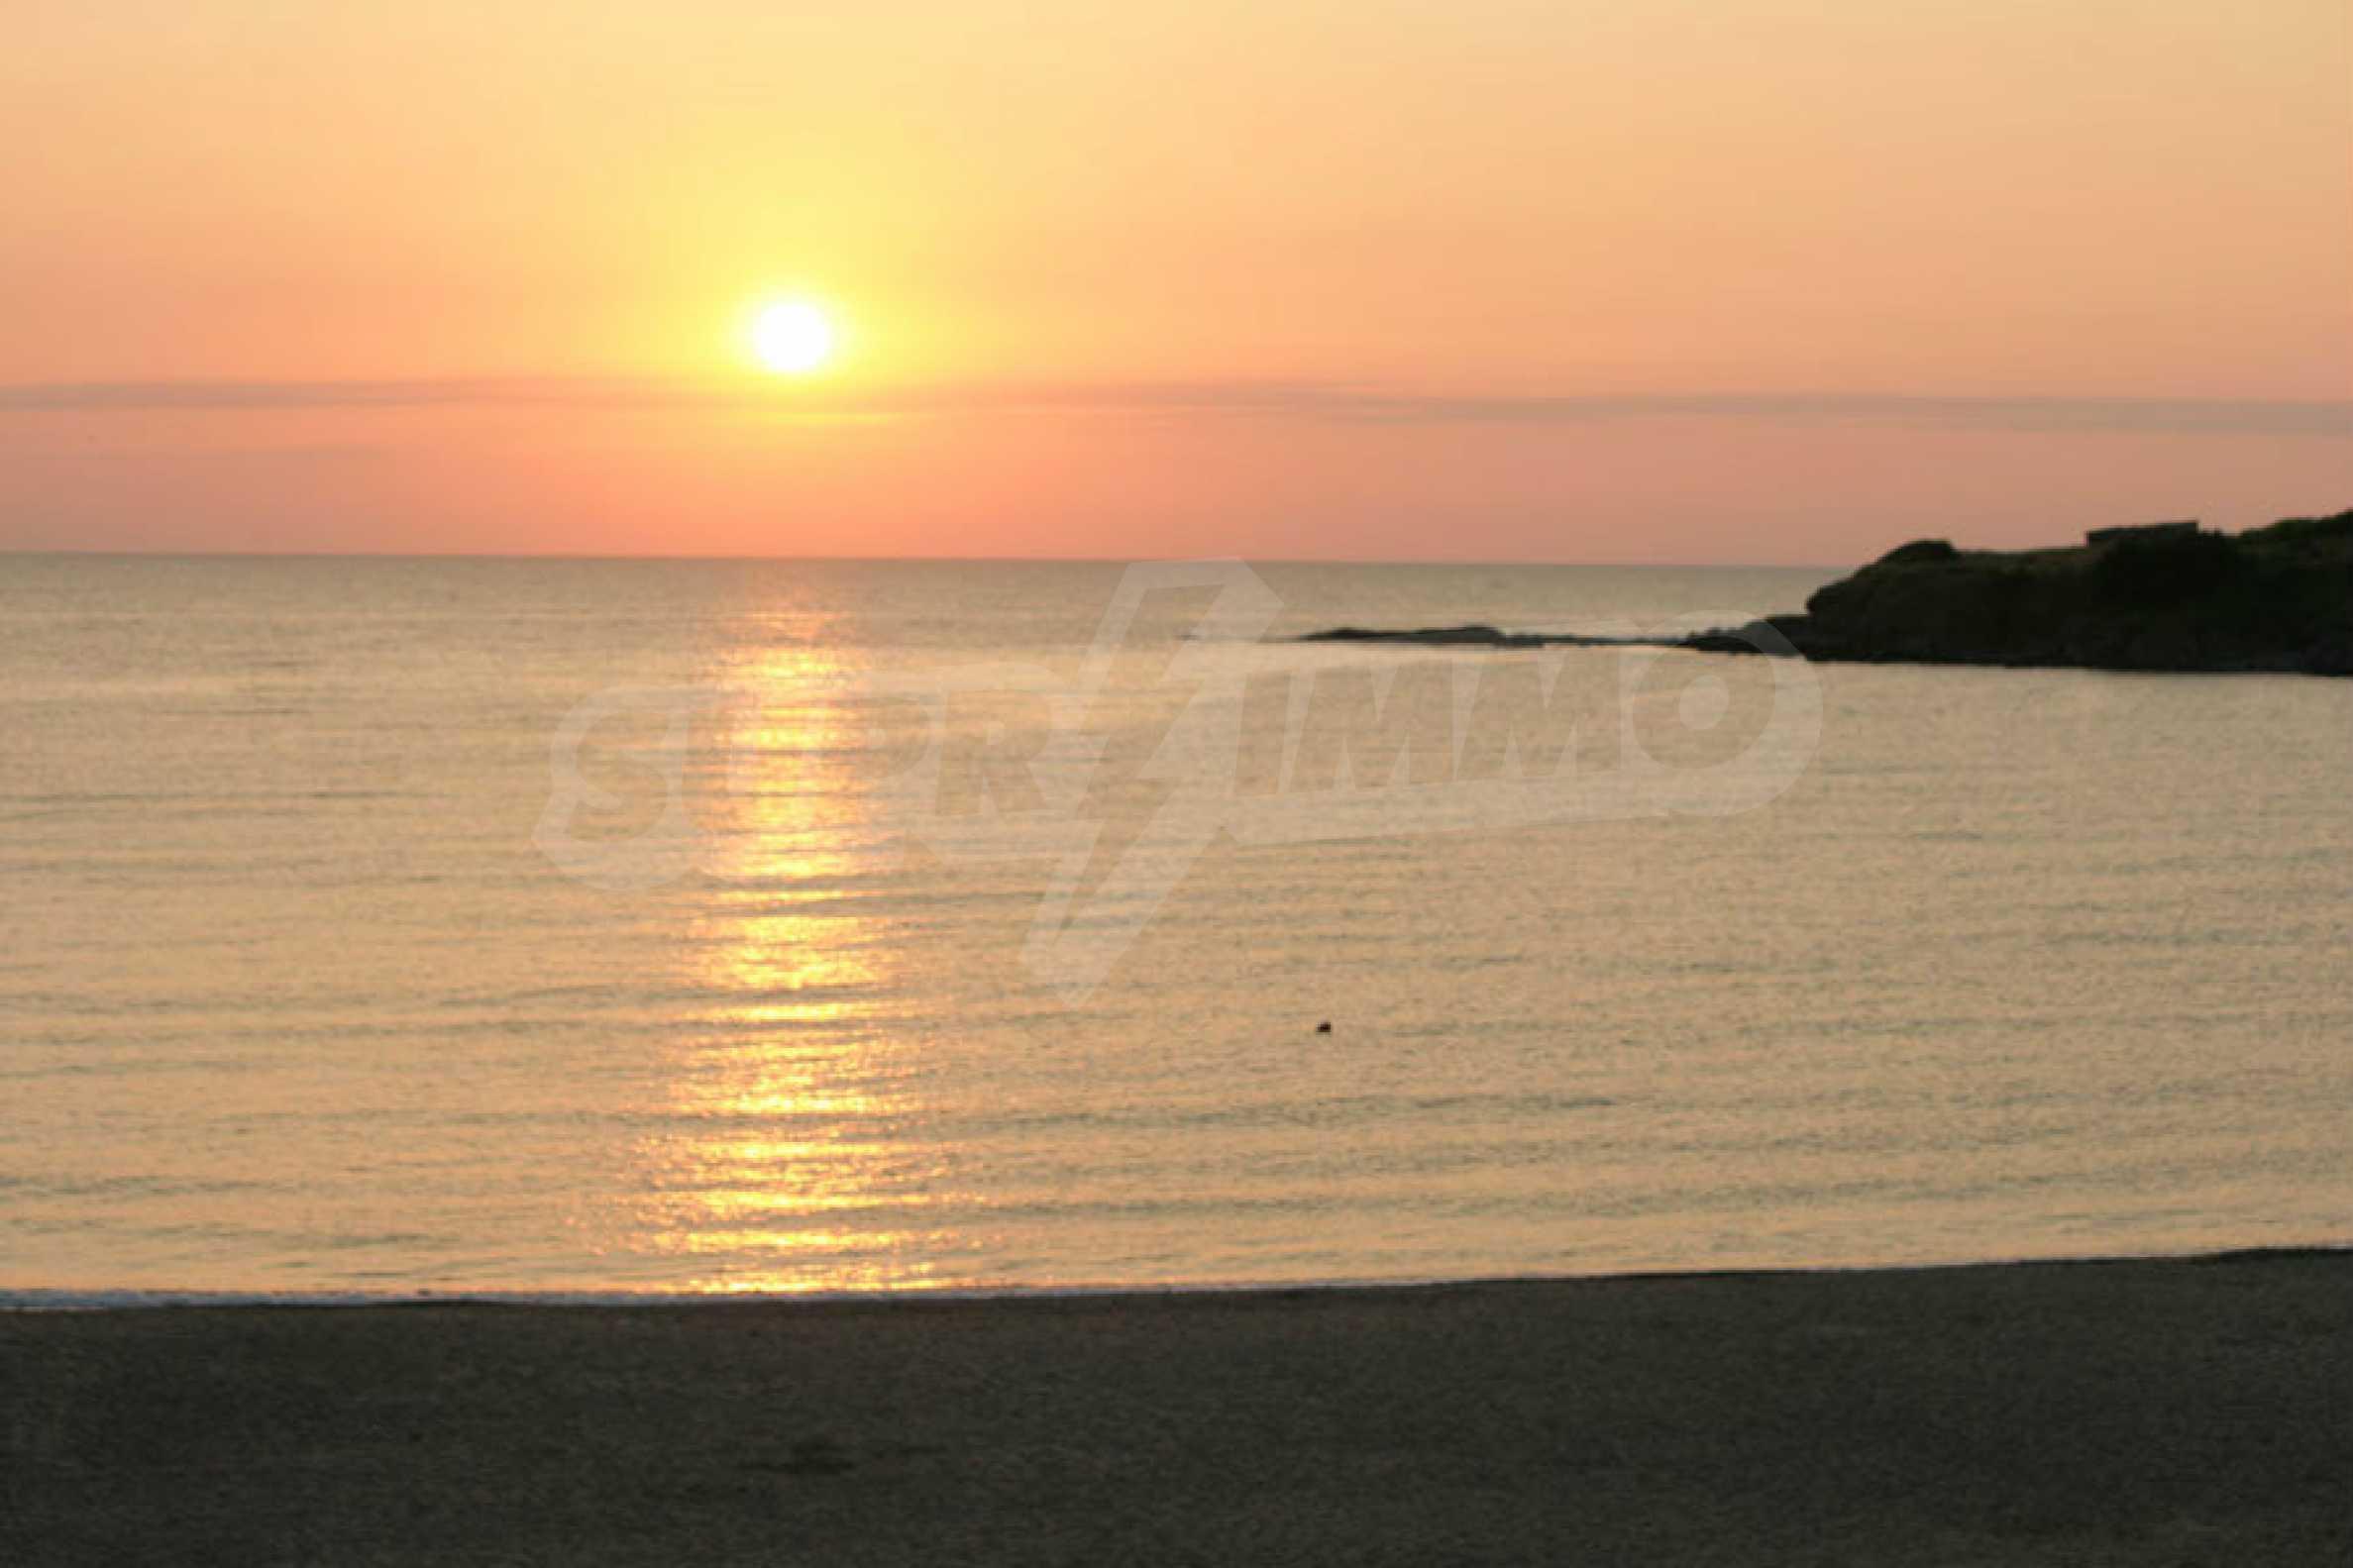 Примеа Бийч Резиденс / Primea Beach Residence 67